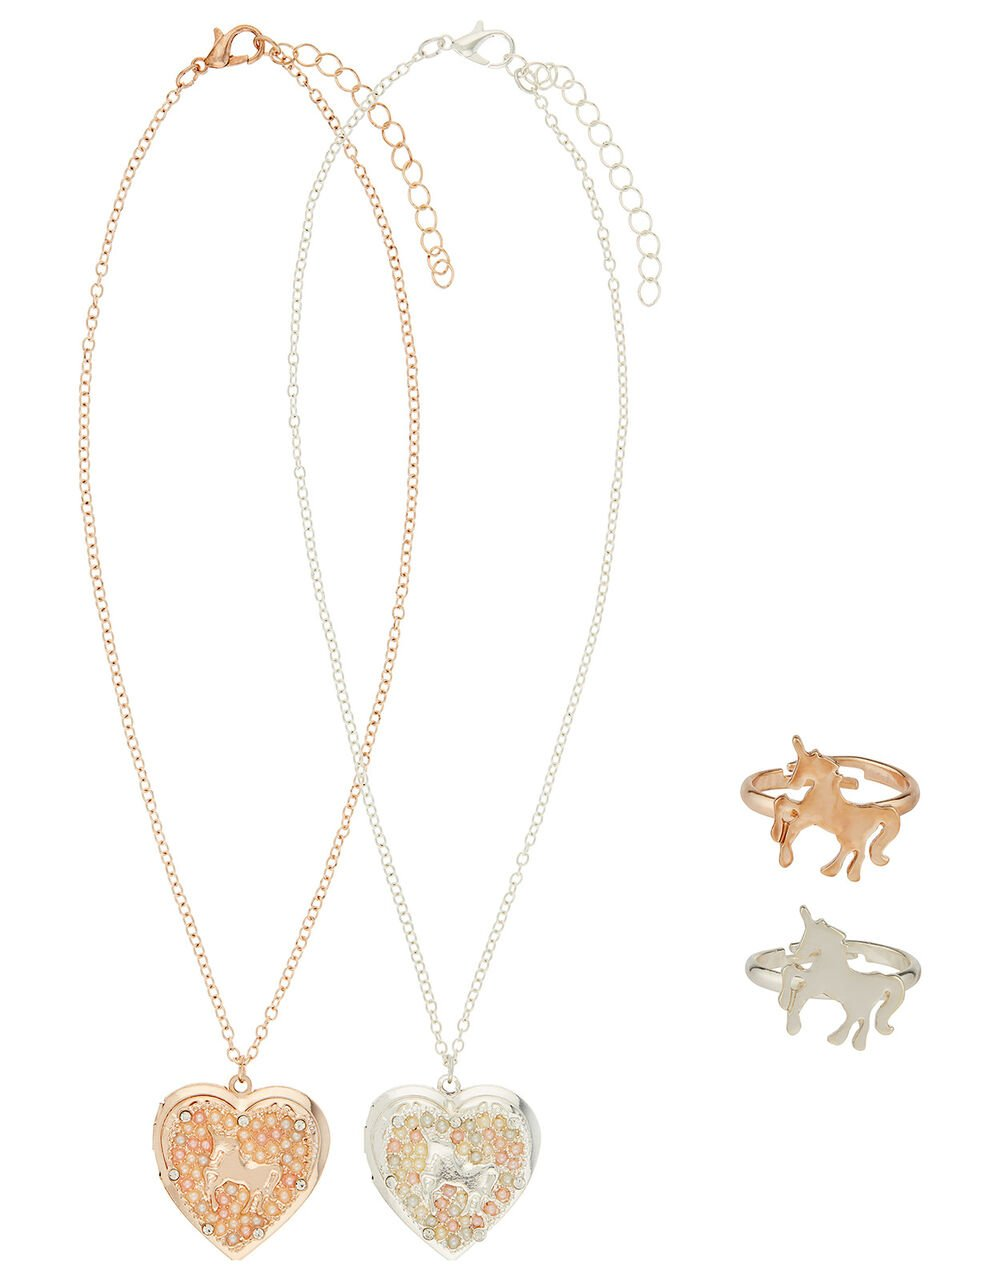 Unicorn Tear-and-Share Locket and Ring Set, , large